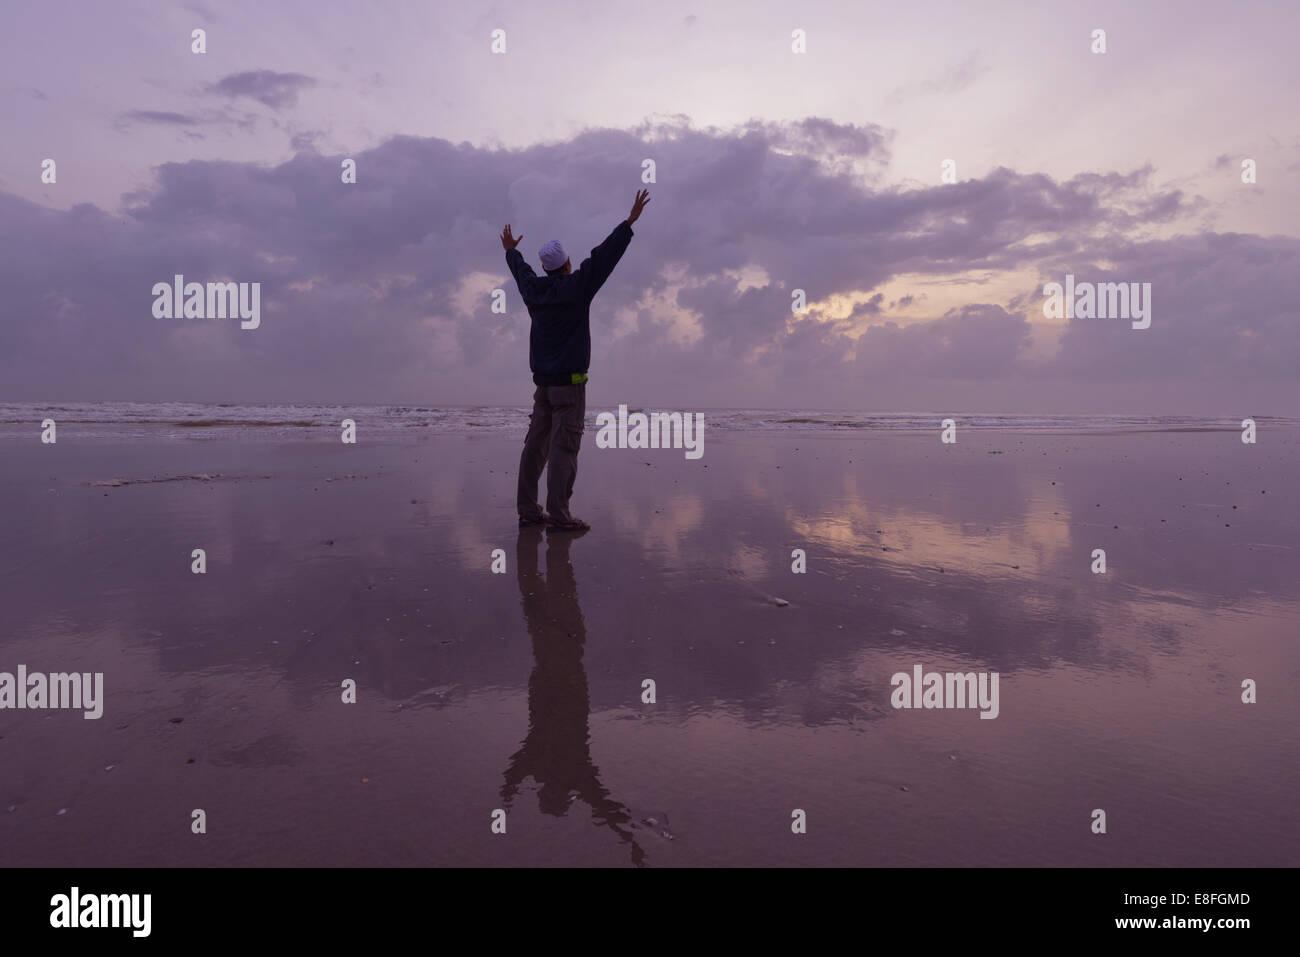 Kuantan, Malaysia Silhouette des Mannes am Strand am Morgen Tag Stockbild